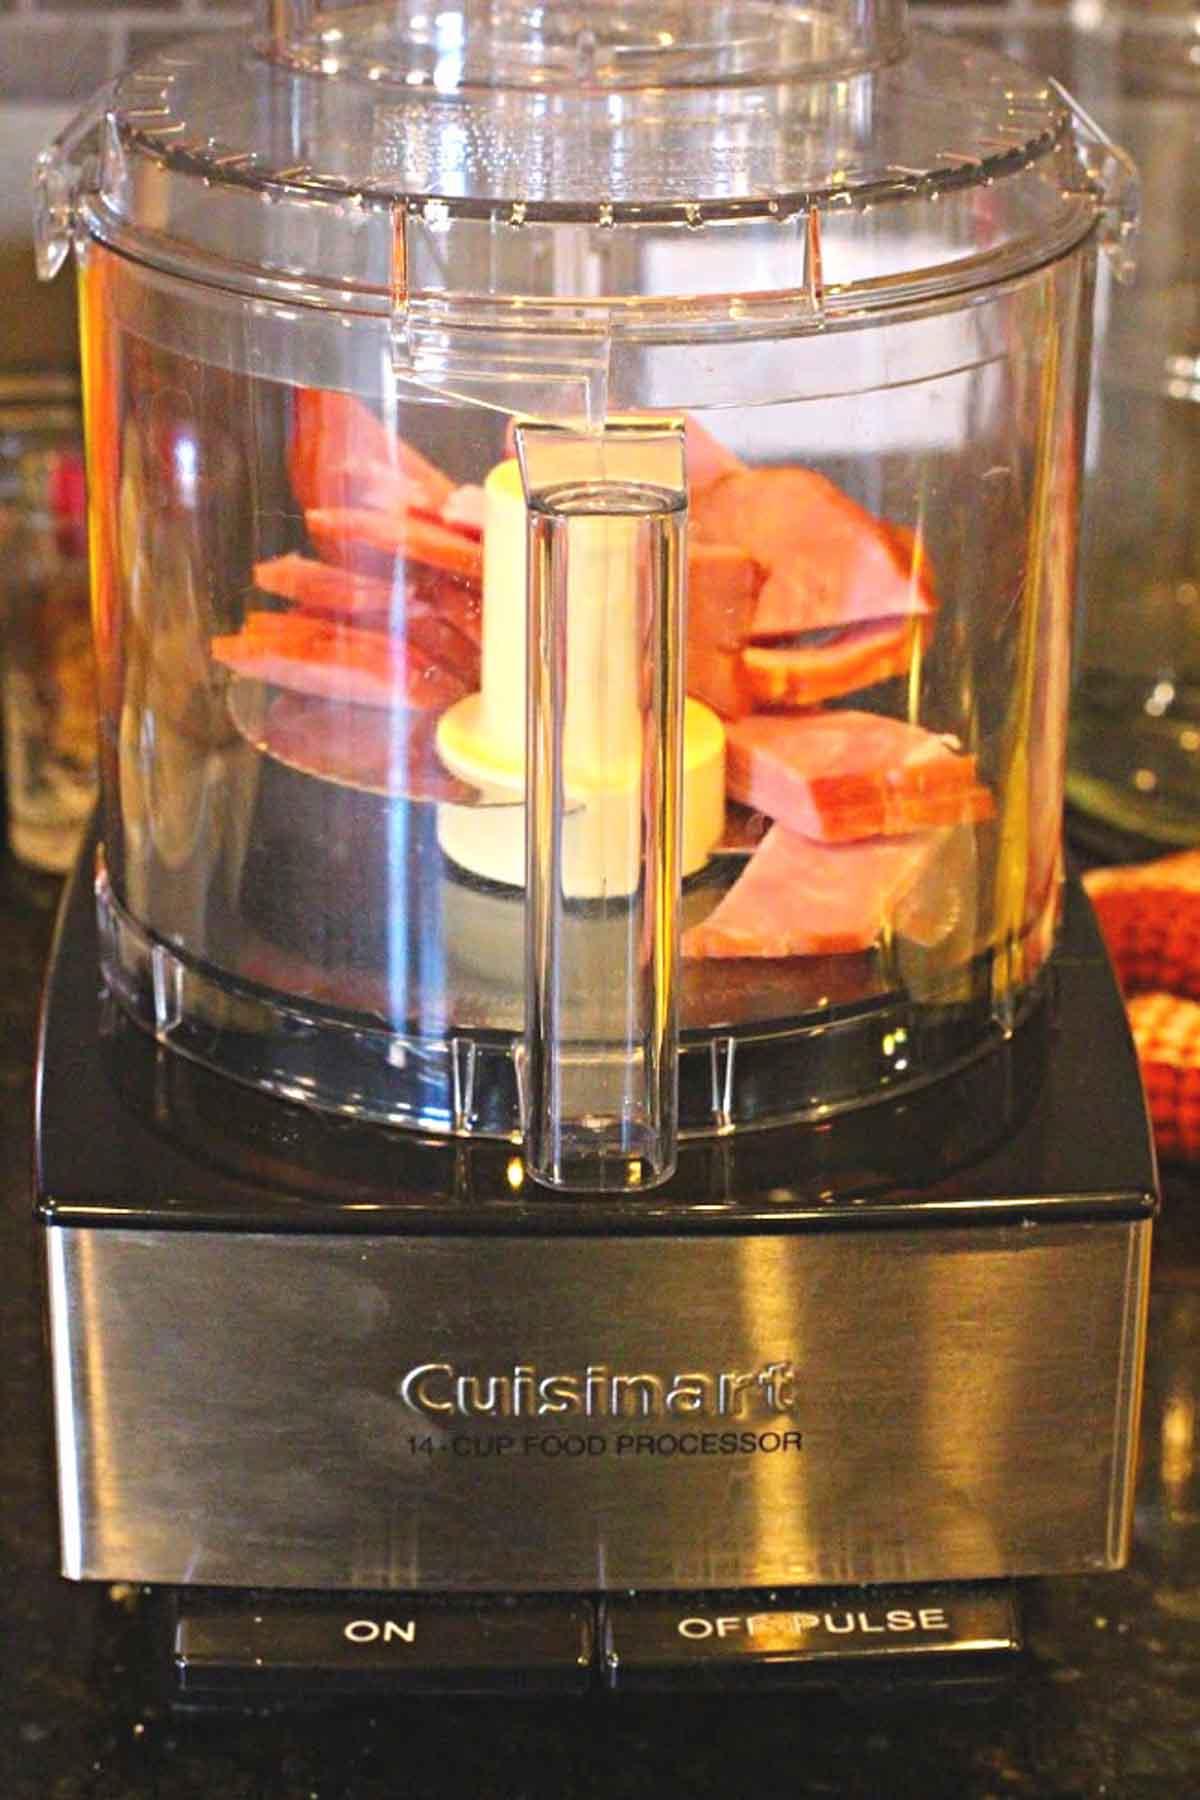 chopping ham in a food processor to make ham salad sandwiches